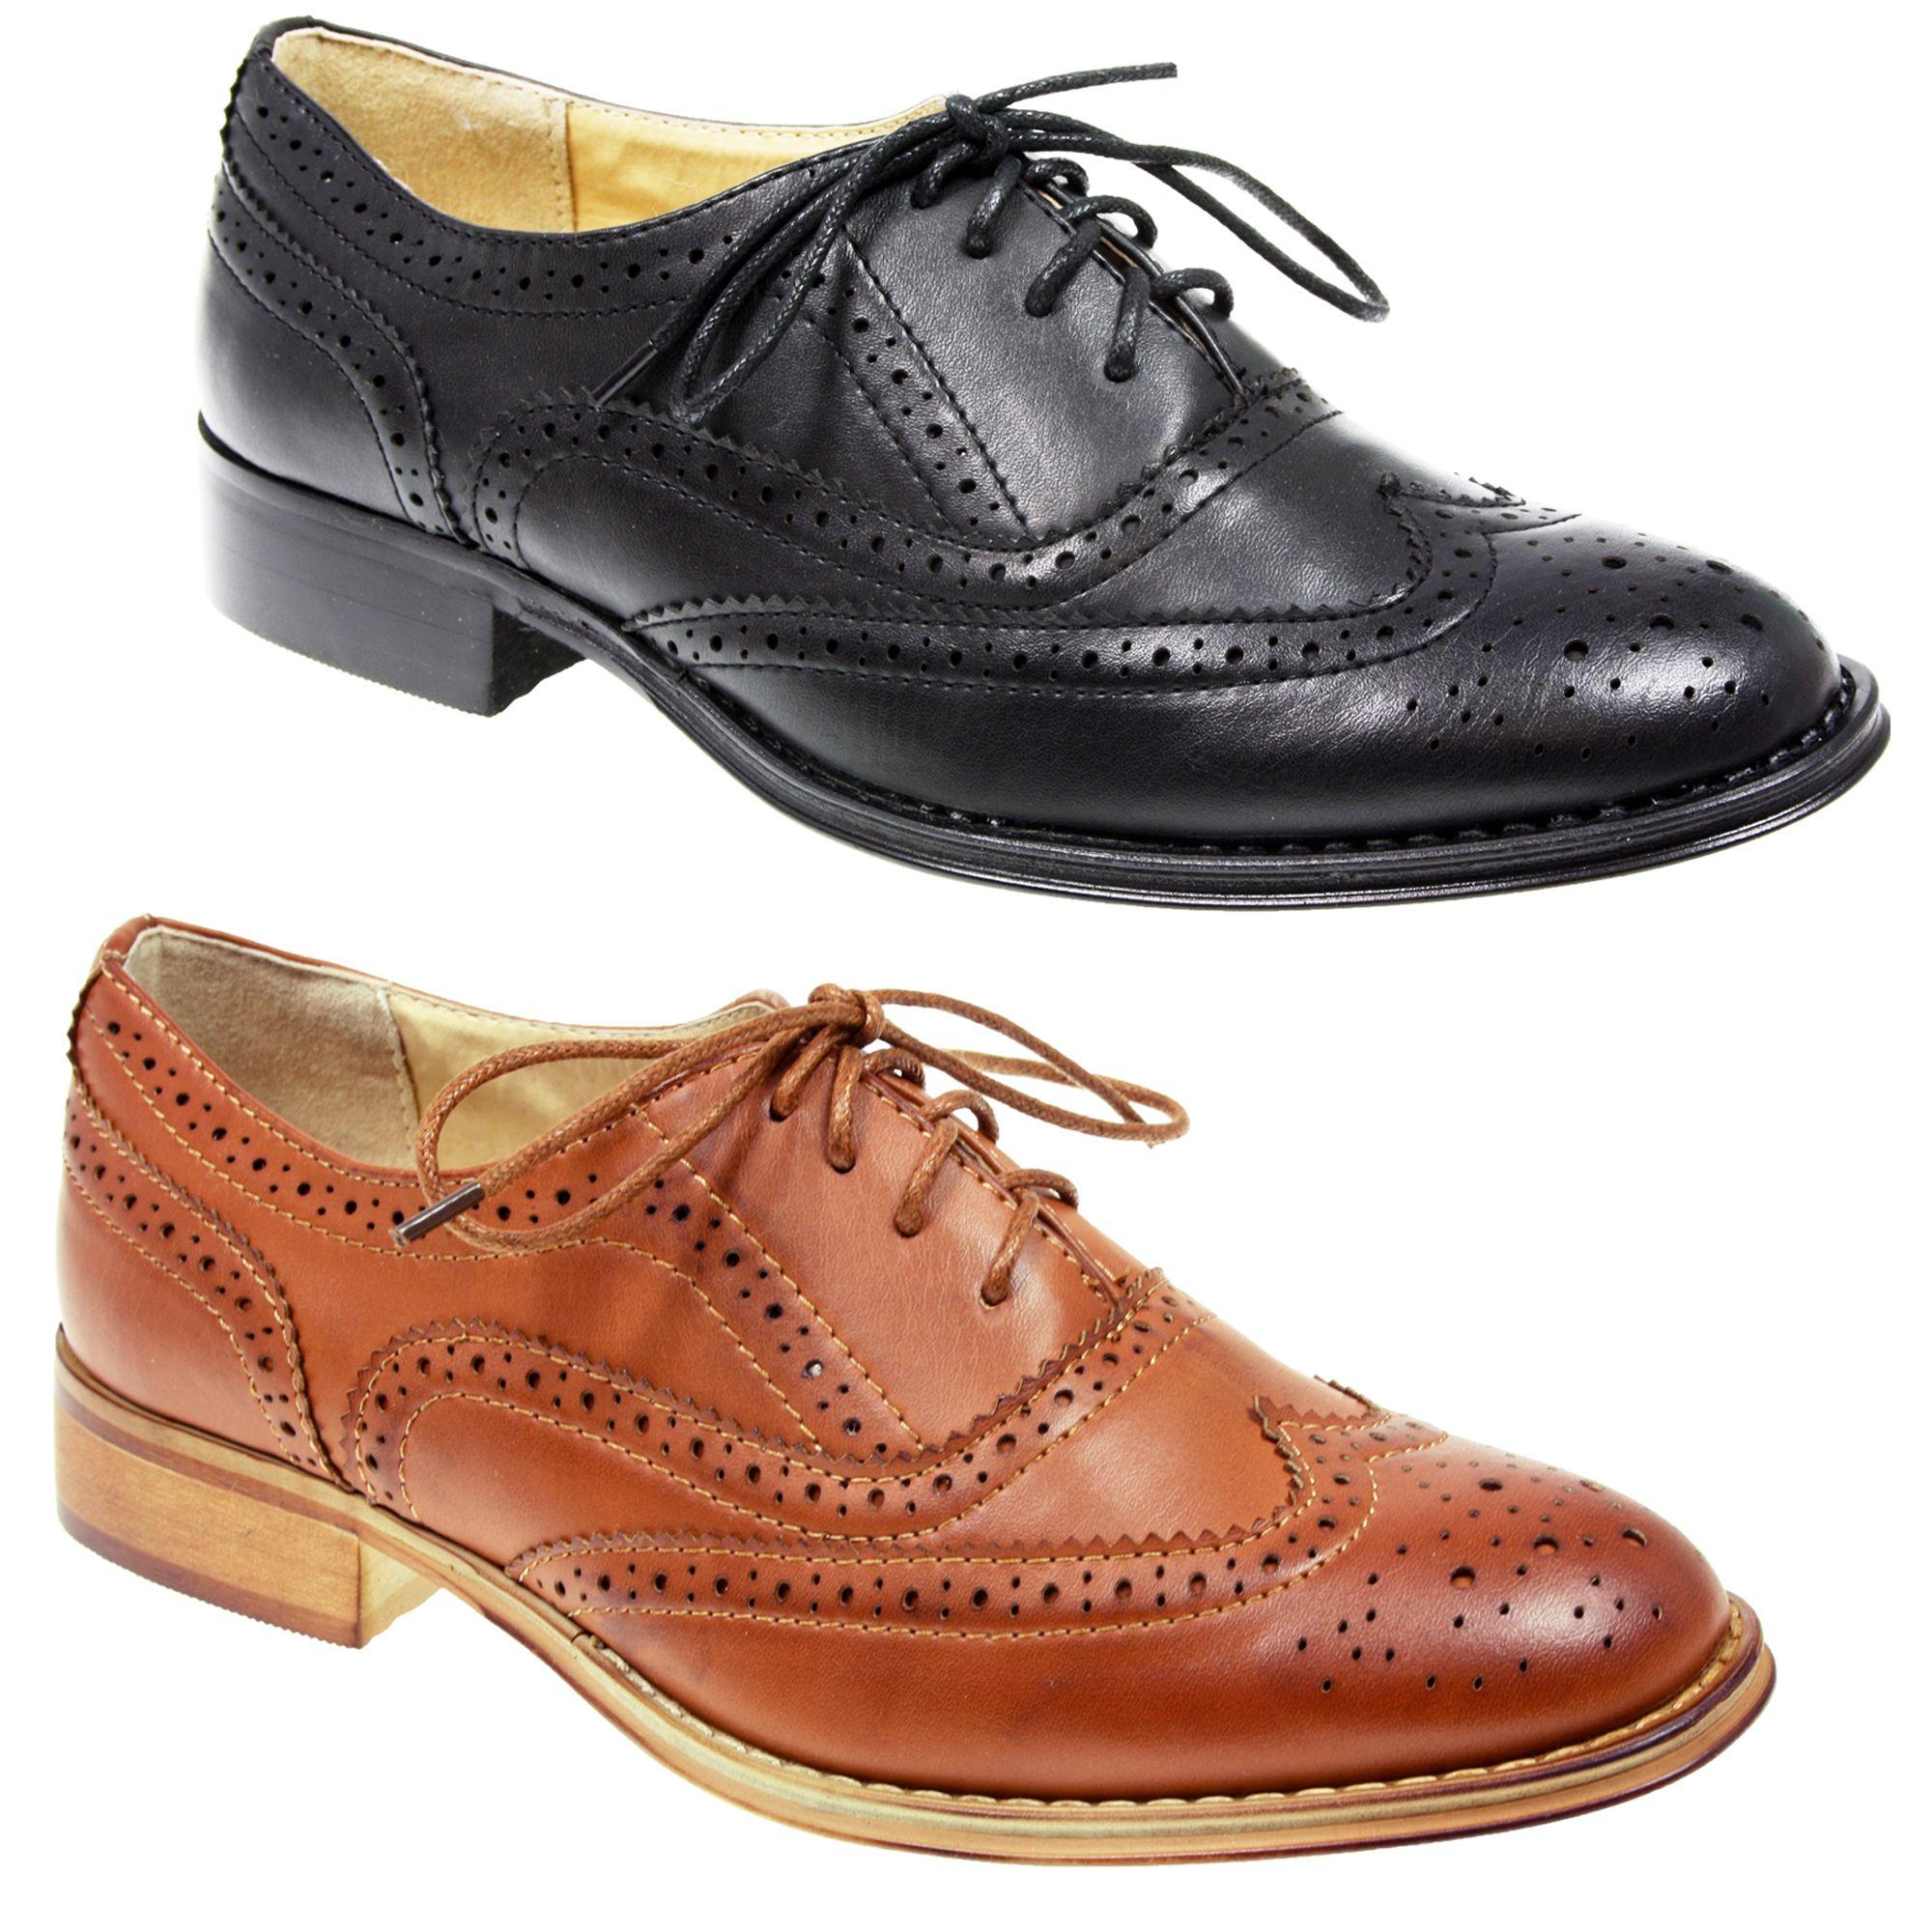 Womens Las Lace Up Flat Office Formal School Oxford Brogue Black Tan Shoes Ebay